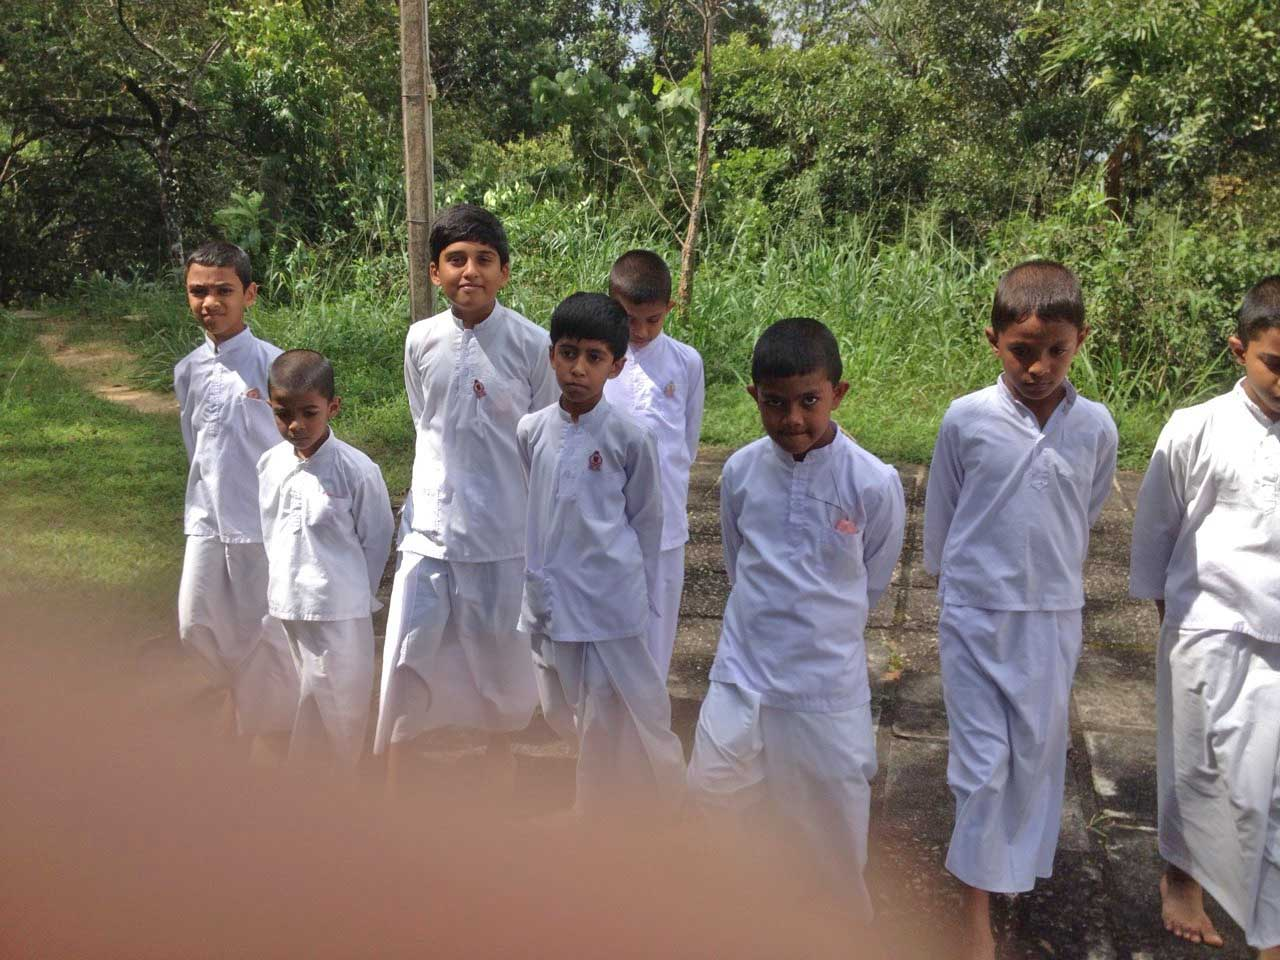 The Introduction of 'Sati Pasala' to the University Sarasavi Daham Pasala at Peradeniya University Viharaya. (4)